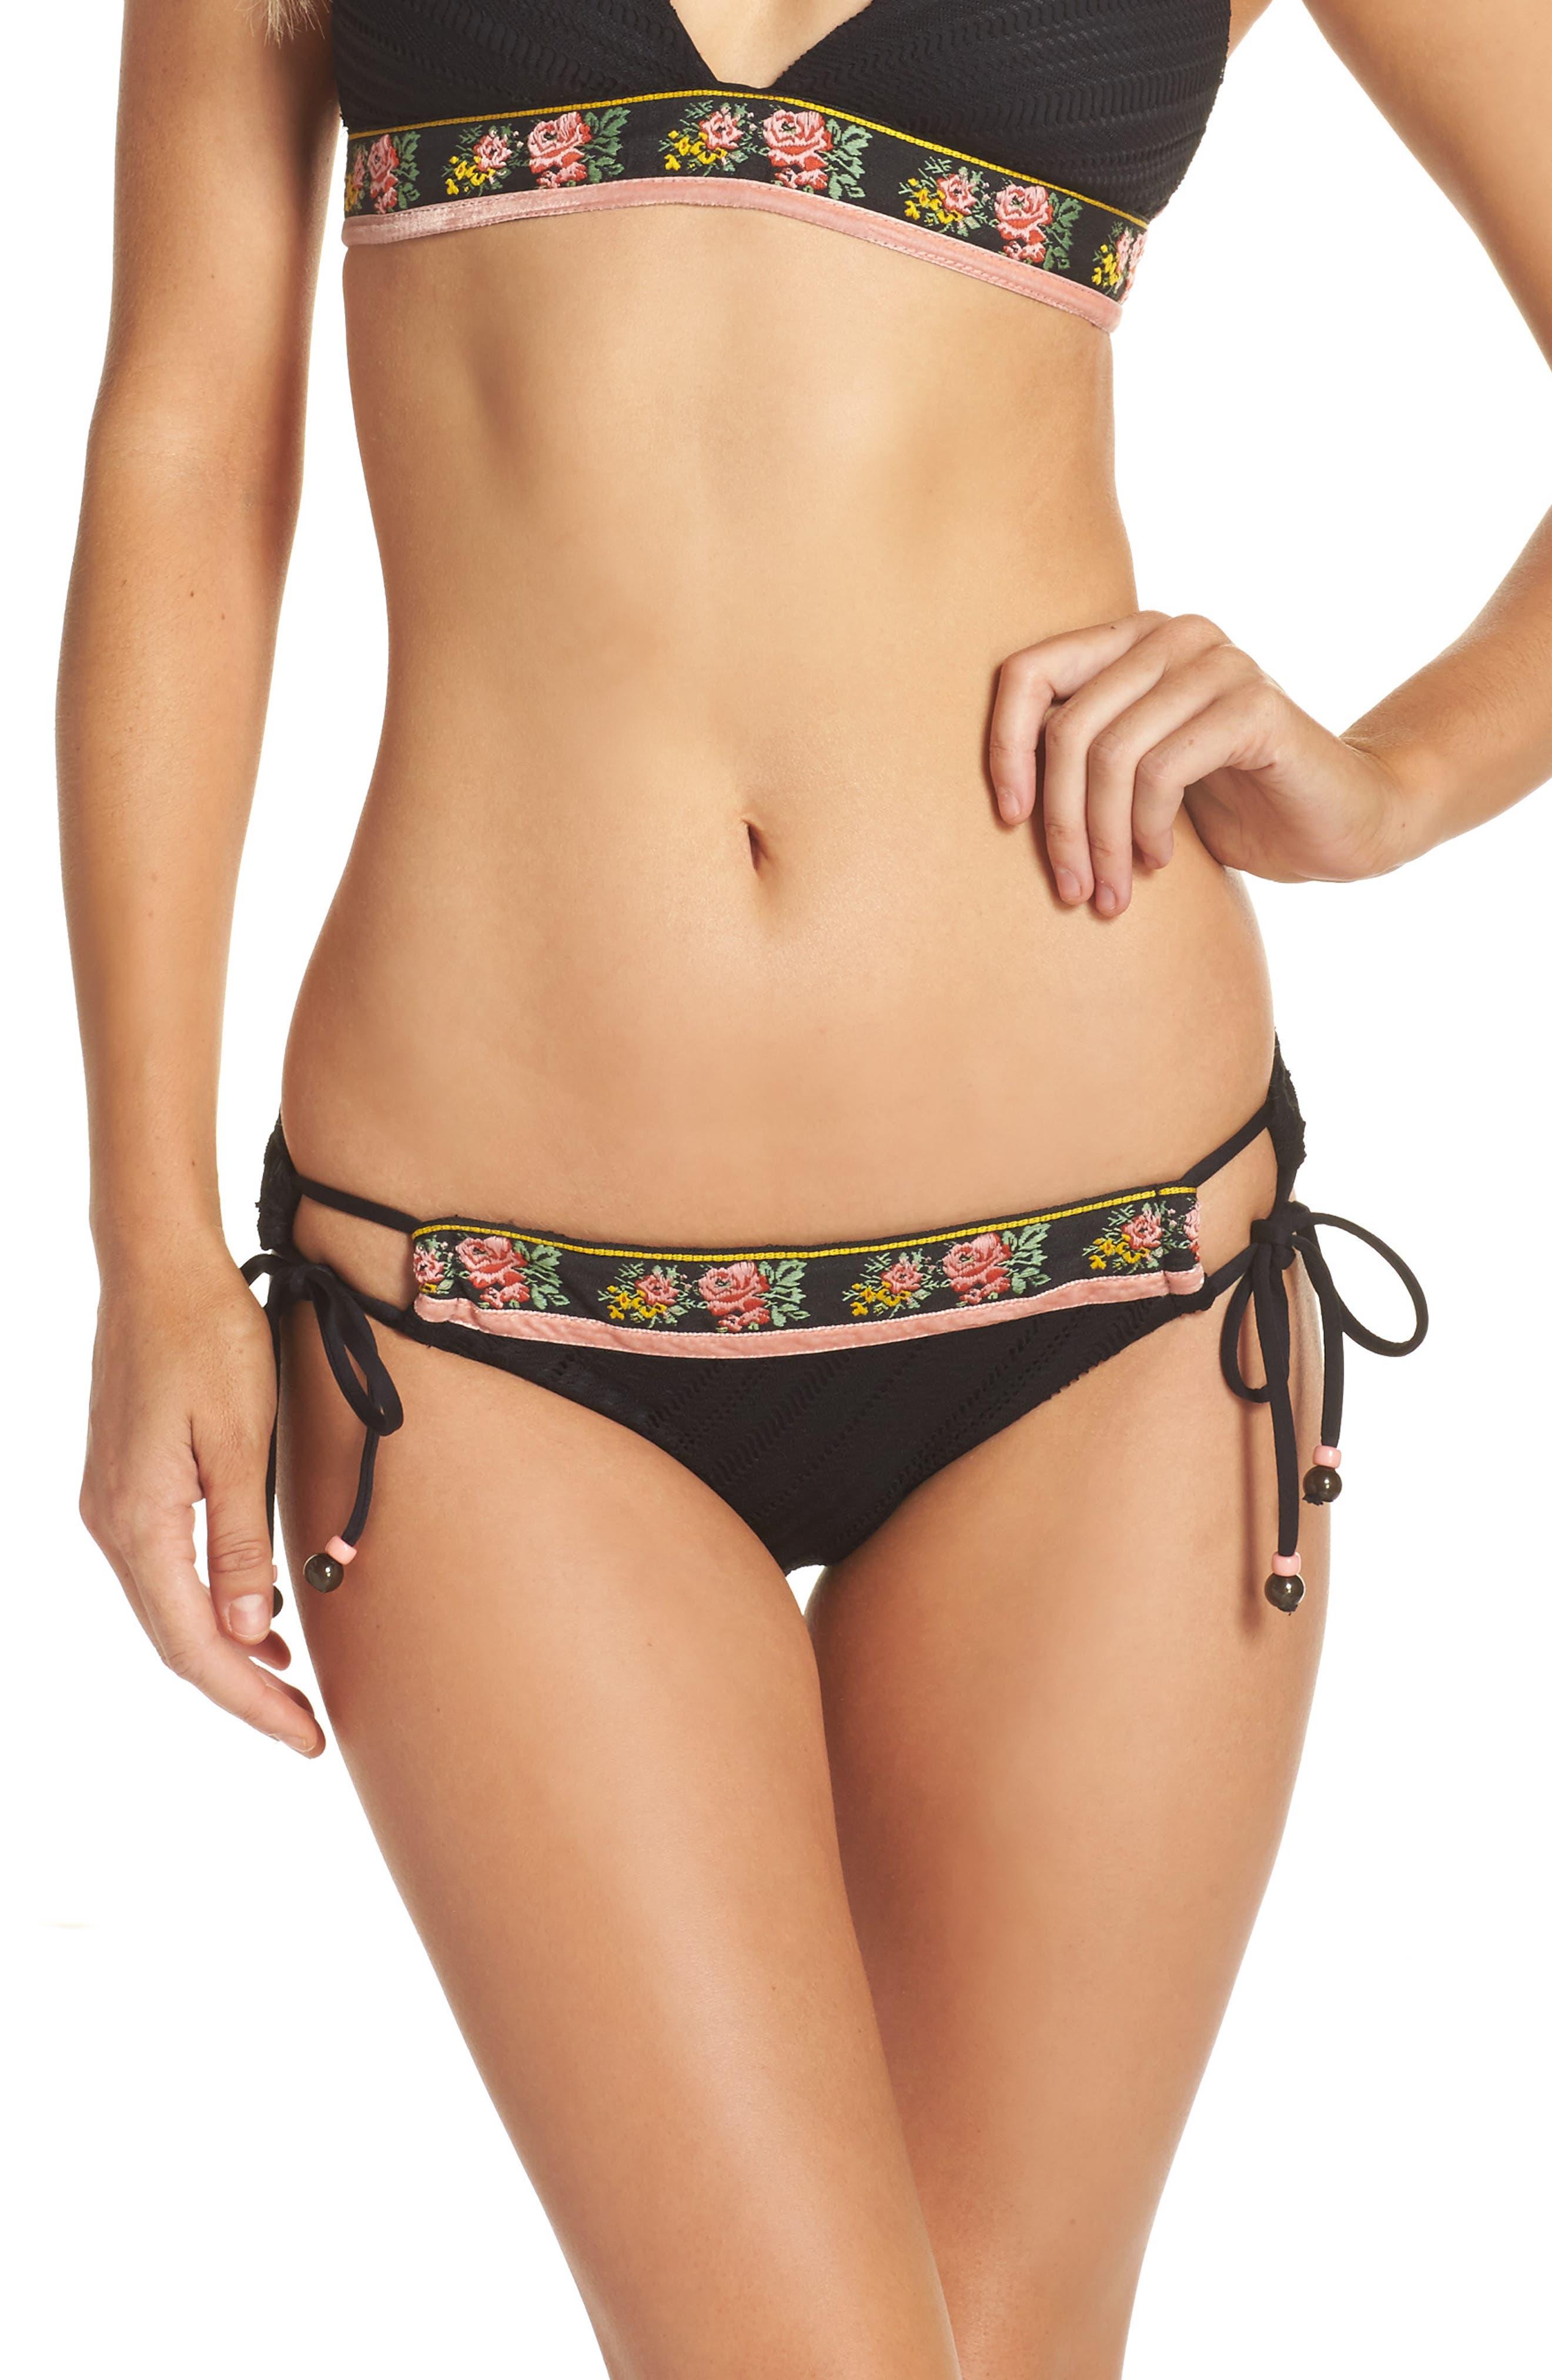 Fortune Teller Bikini Bottoms,                         Main,                         color, Black